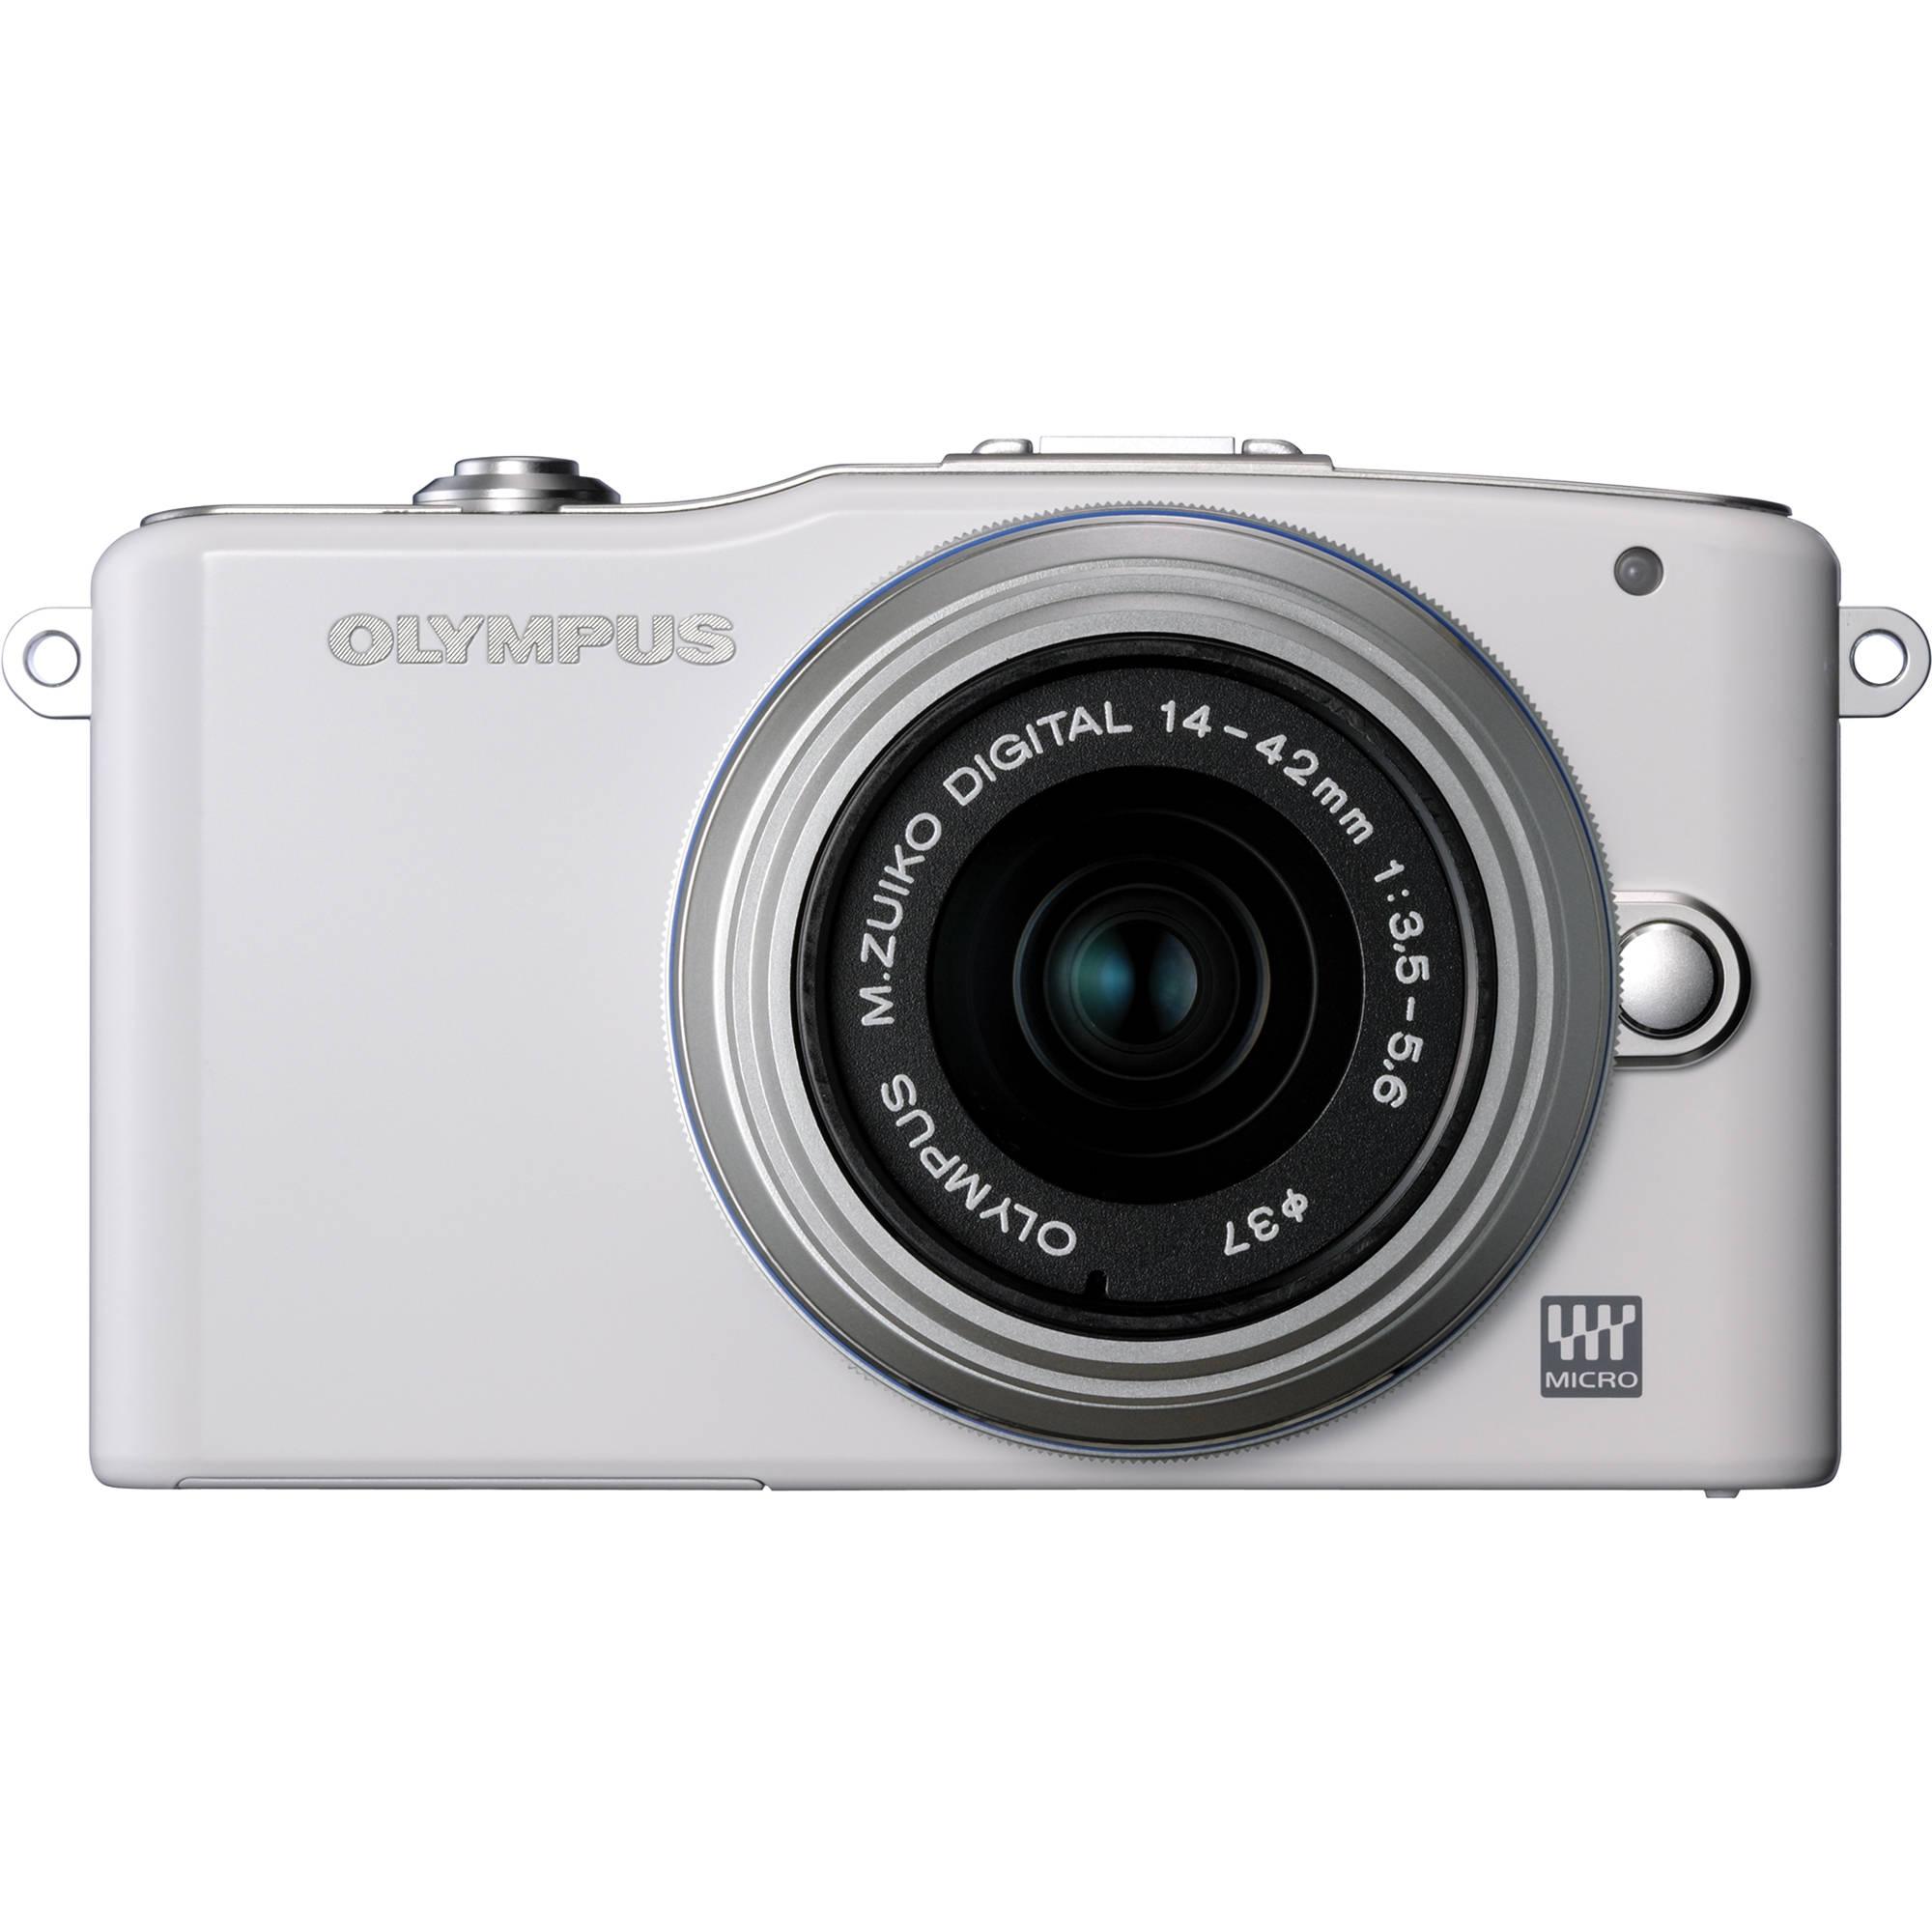 Olympus Digital Camera: Olympus E-PM1 Mirrorless Micro Four Thirds Digital